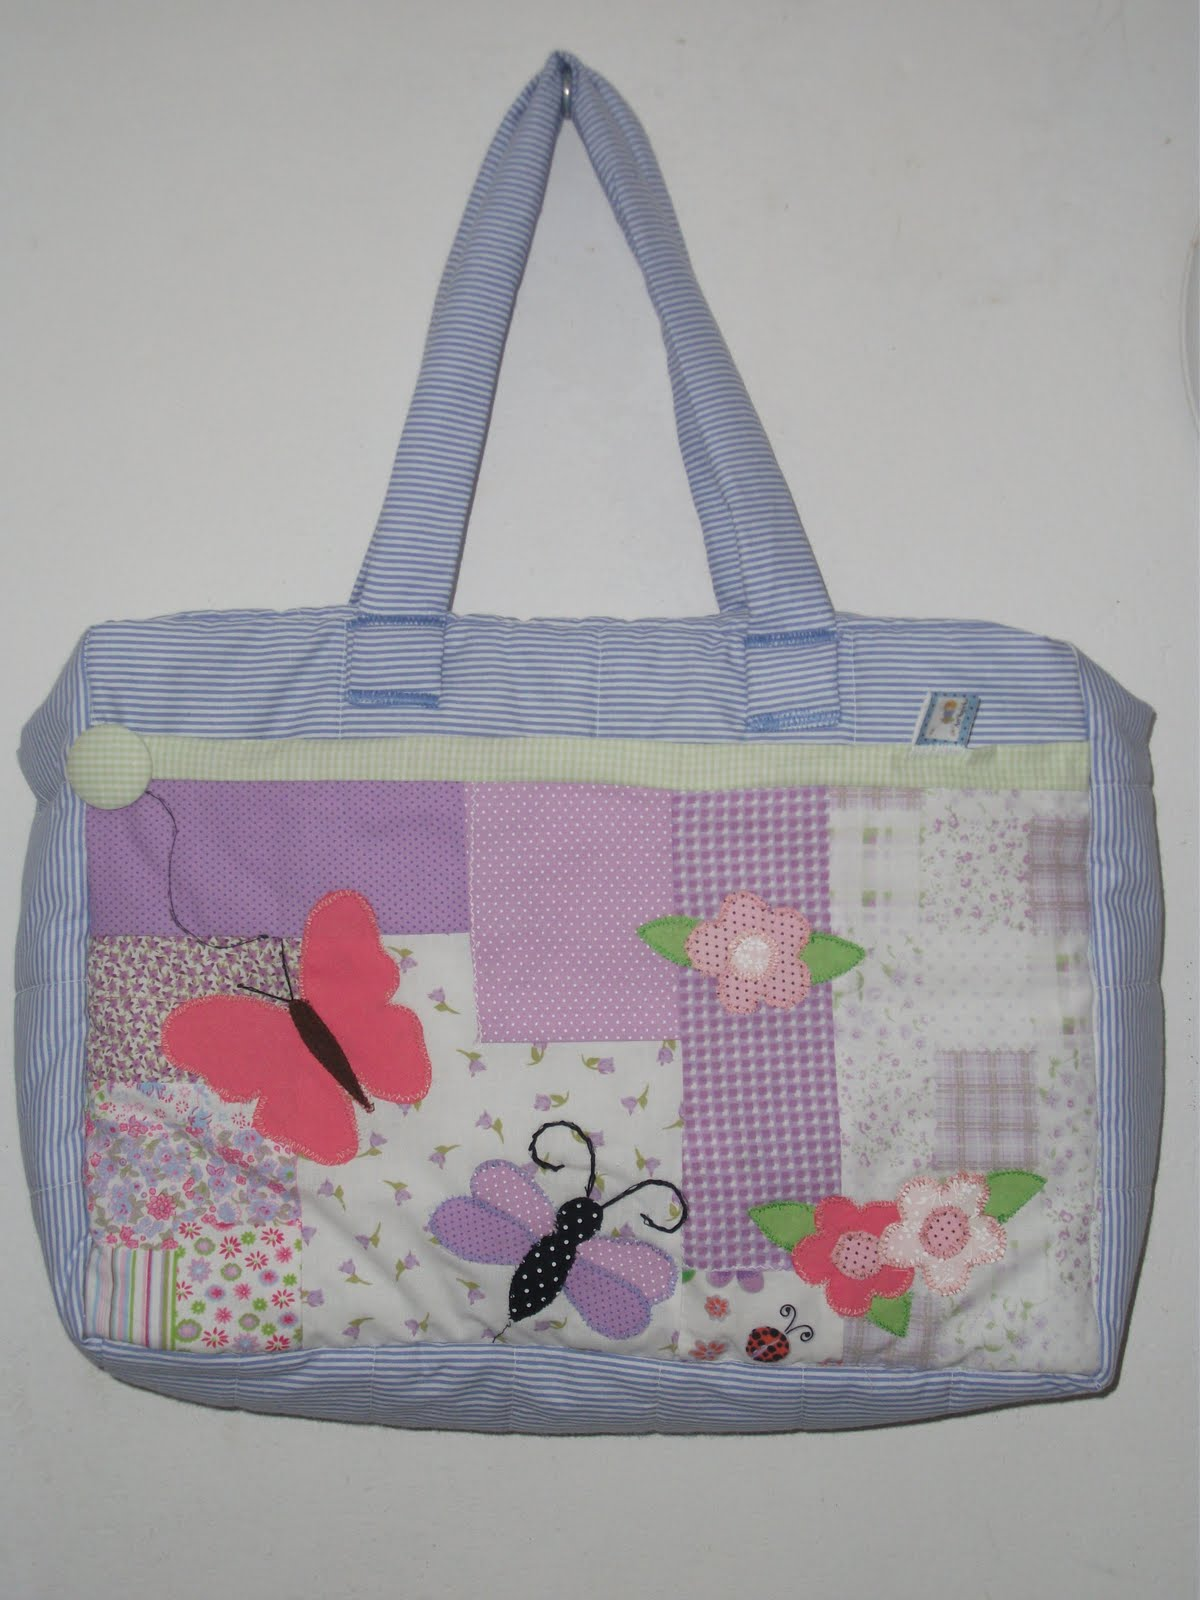 Bolsa De Tecido Bebe : Art sapeka bolsa de beb? patchwork